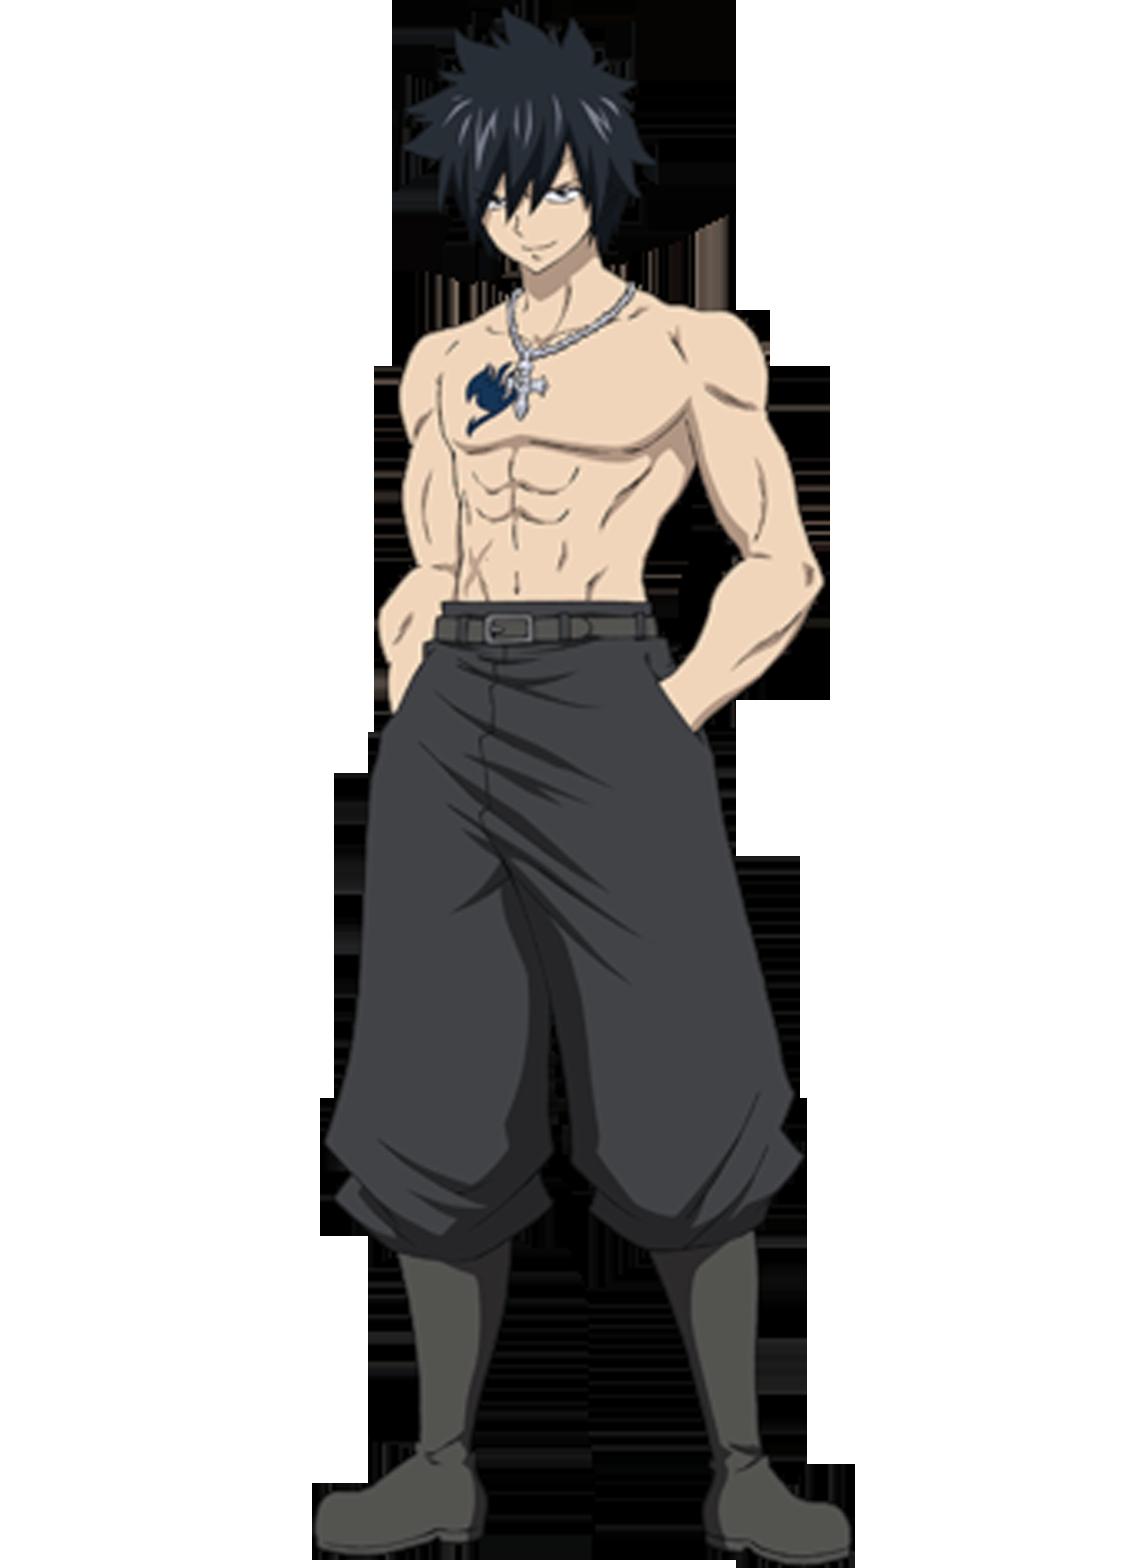 Gray Fullbuster Season Finale Anime Luta Personagens De Anime Fairy Tail Personagens